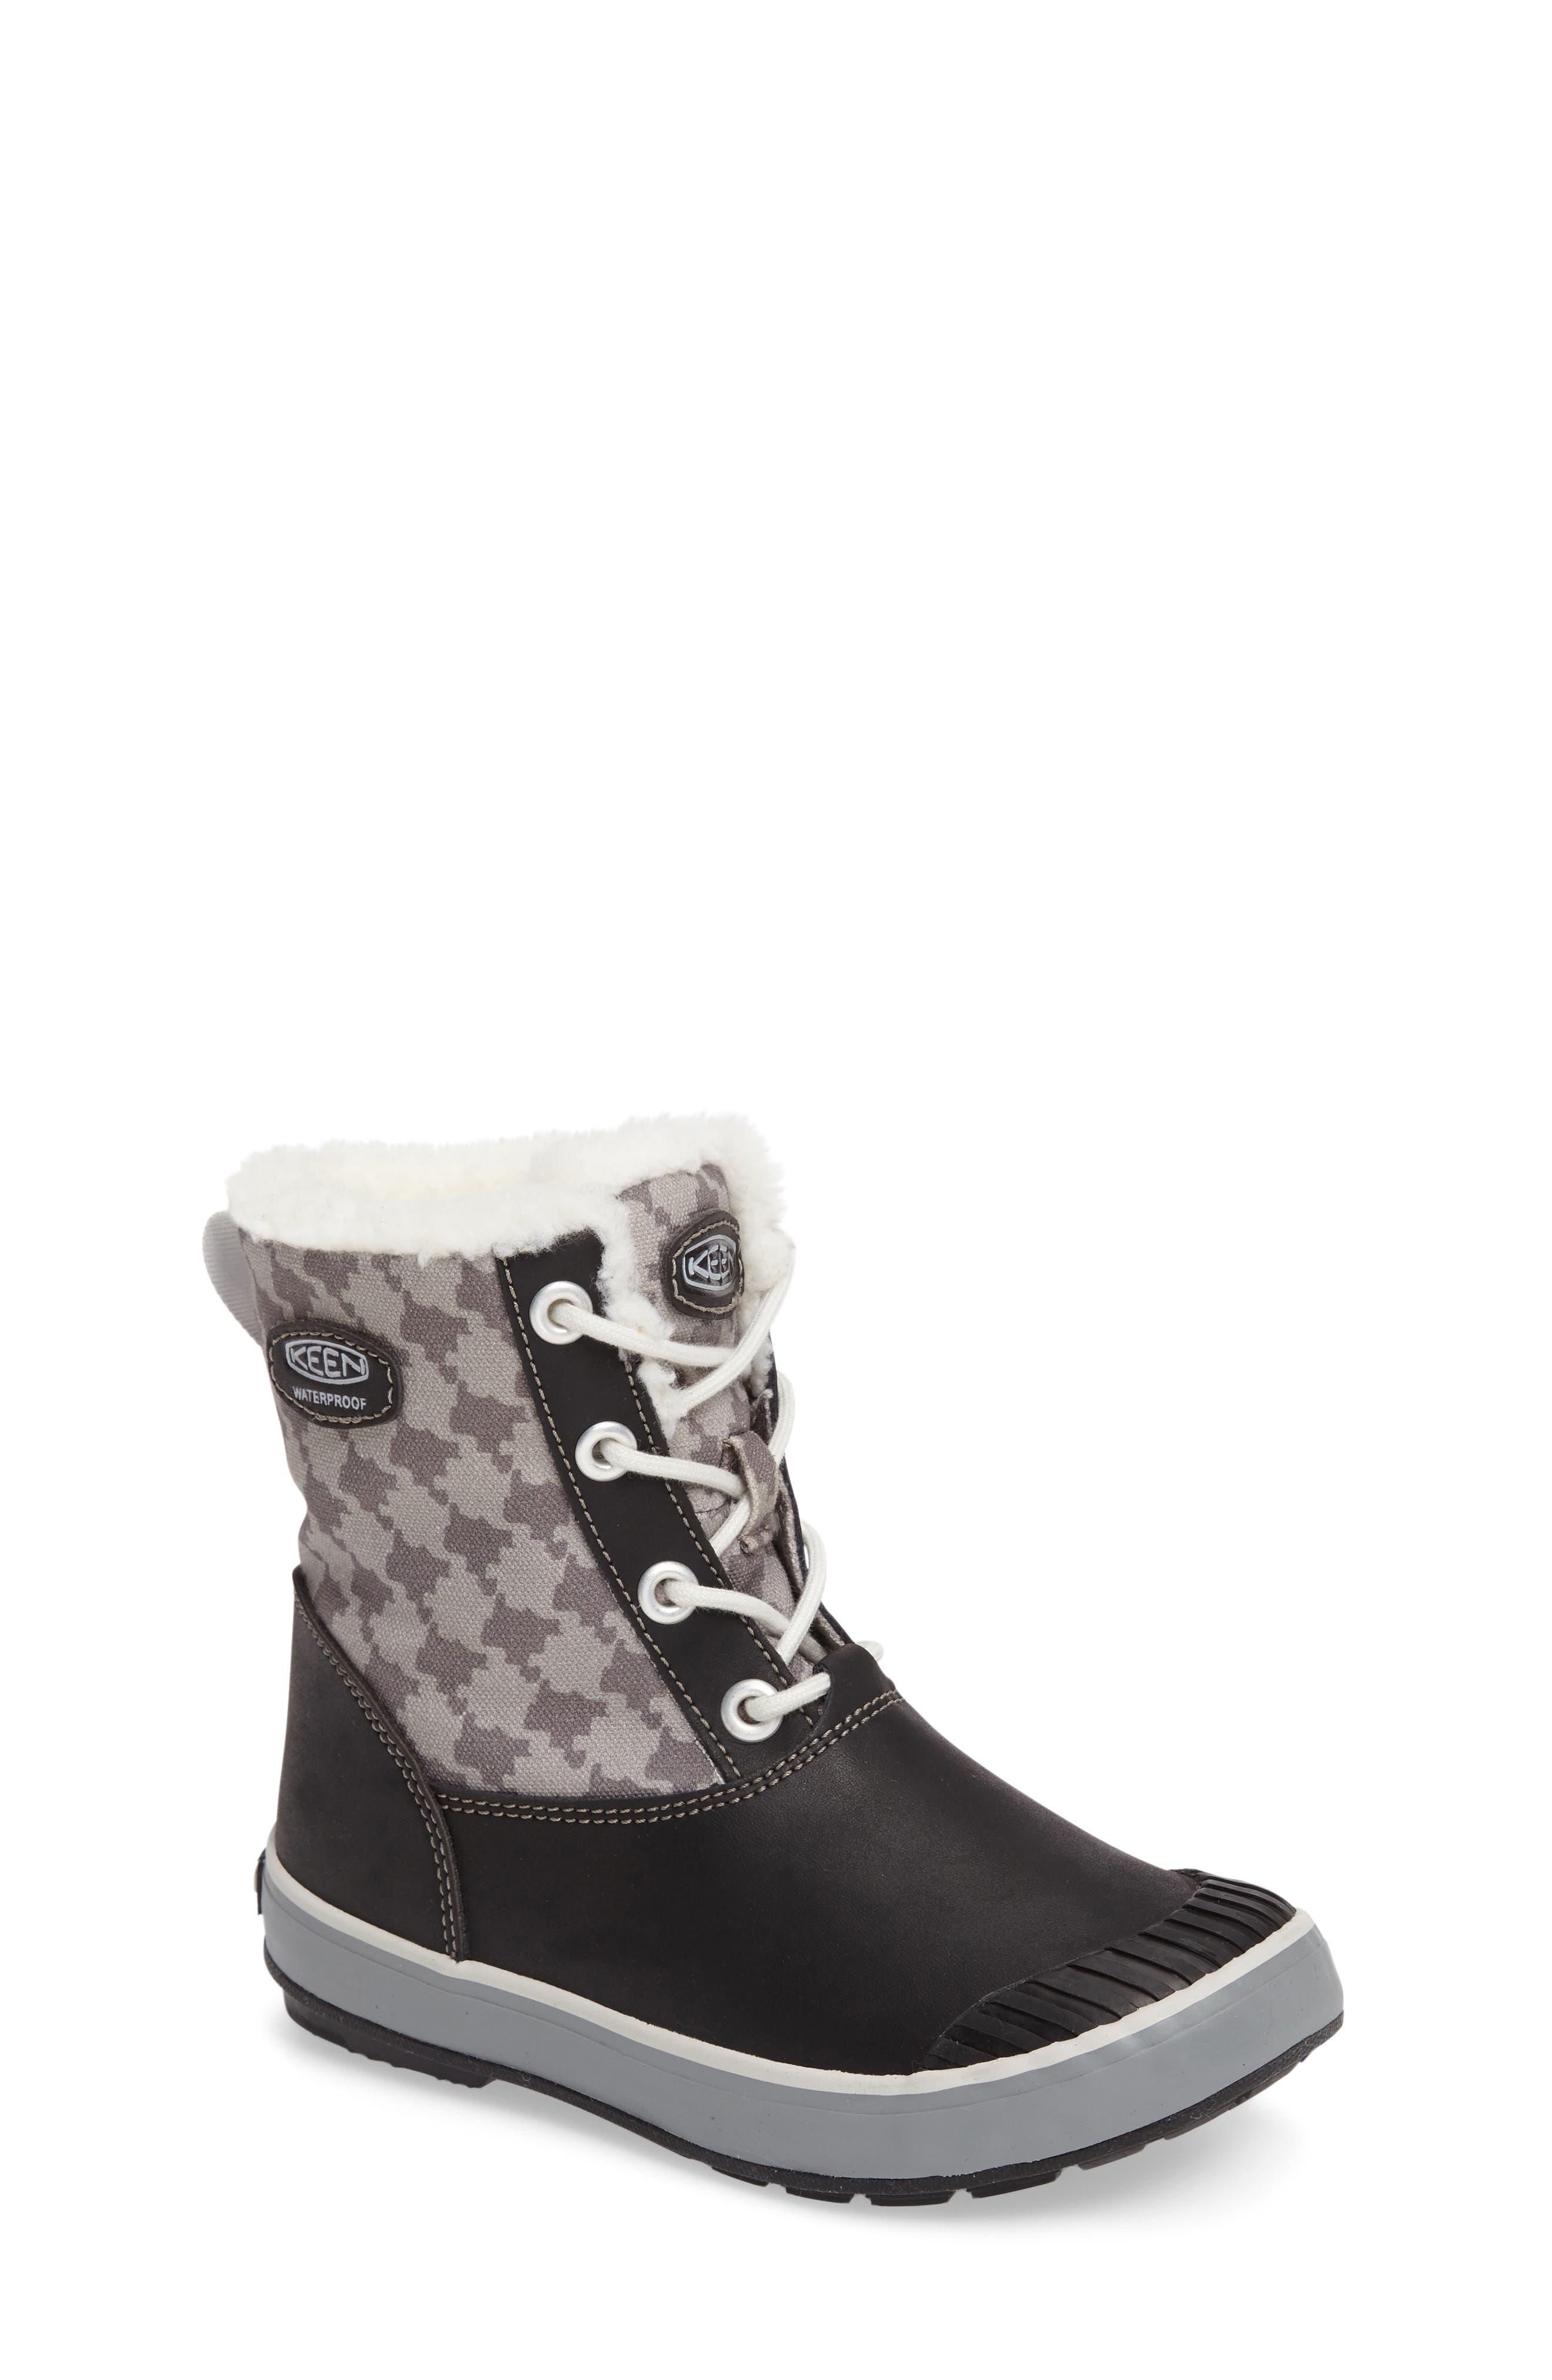 Elsa Waterproof Faux Fur Lined Snow Boot,                         Main,                         color,